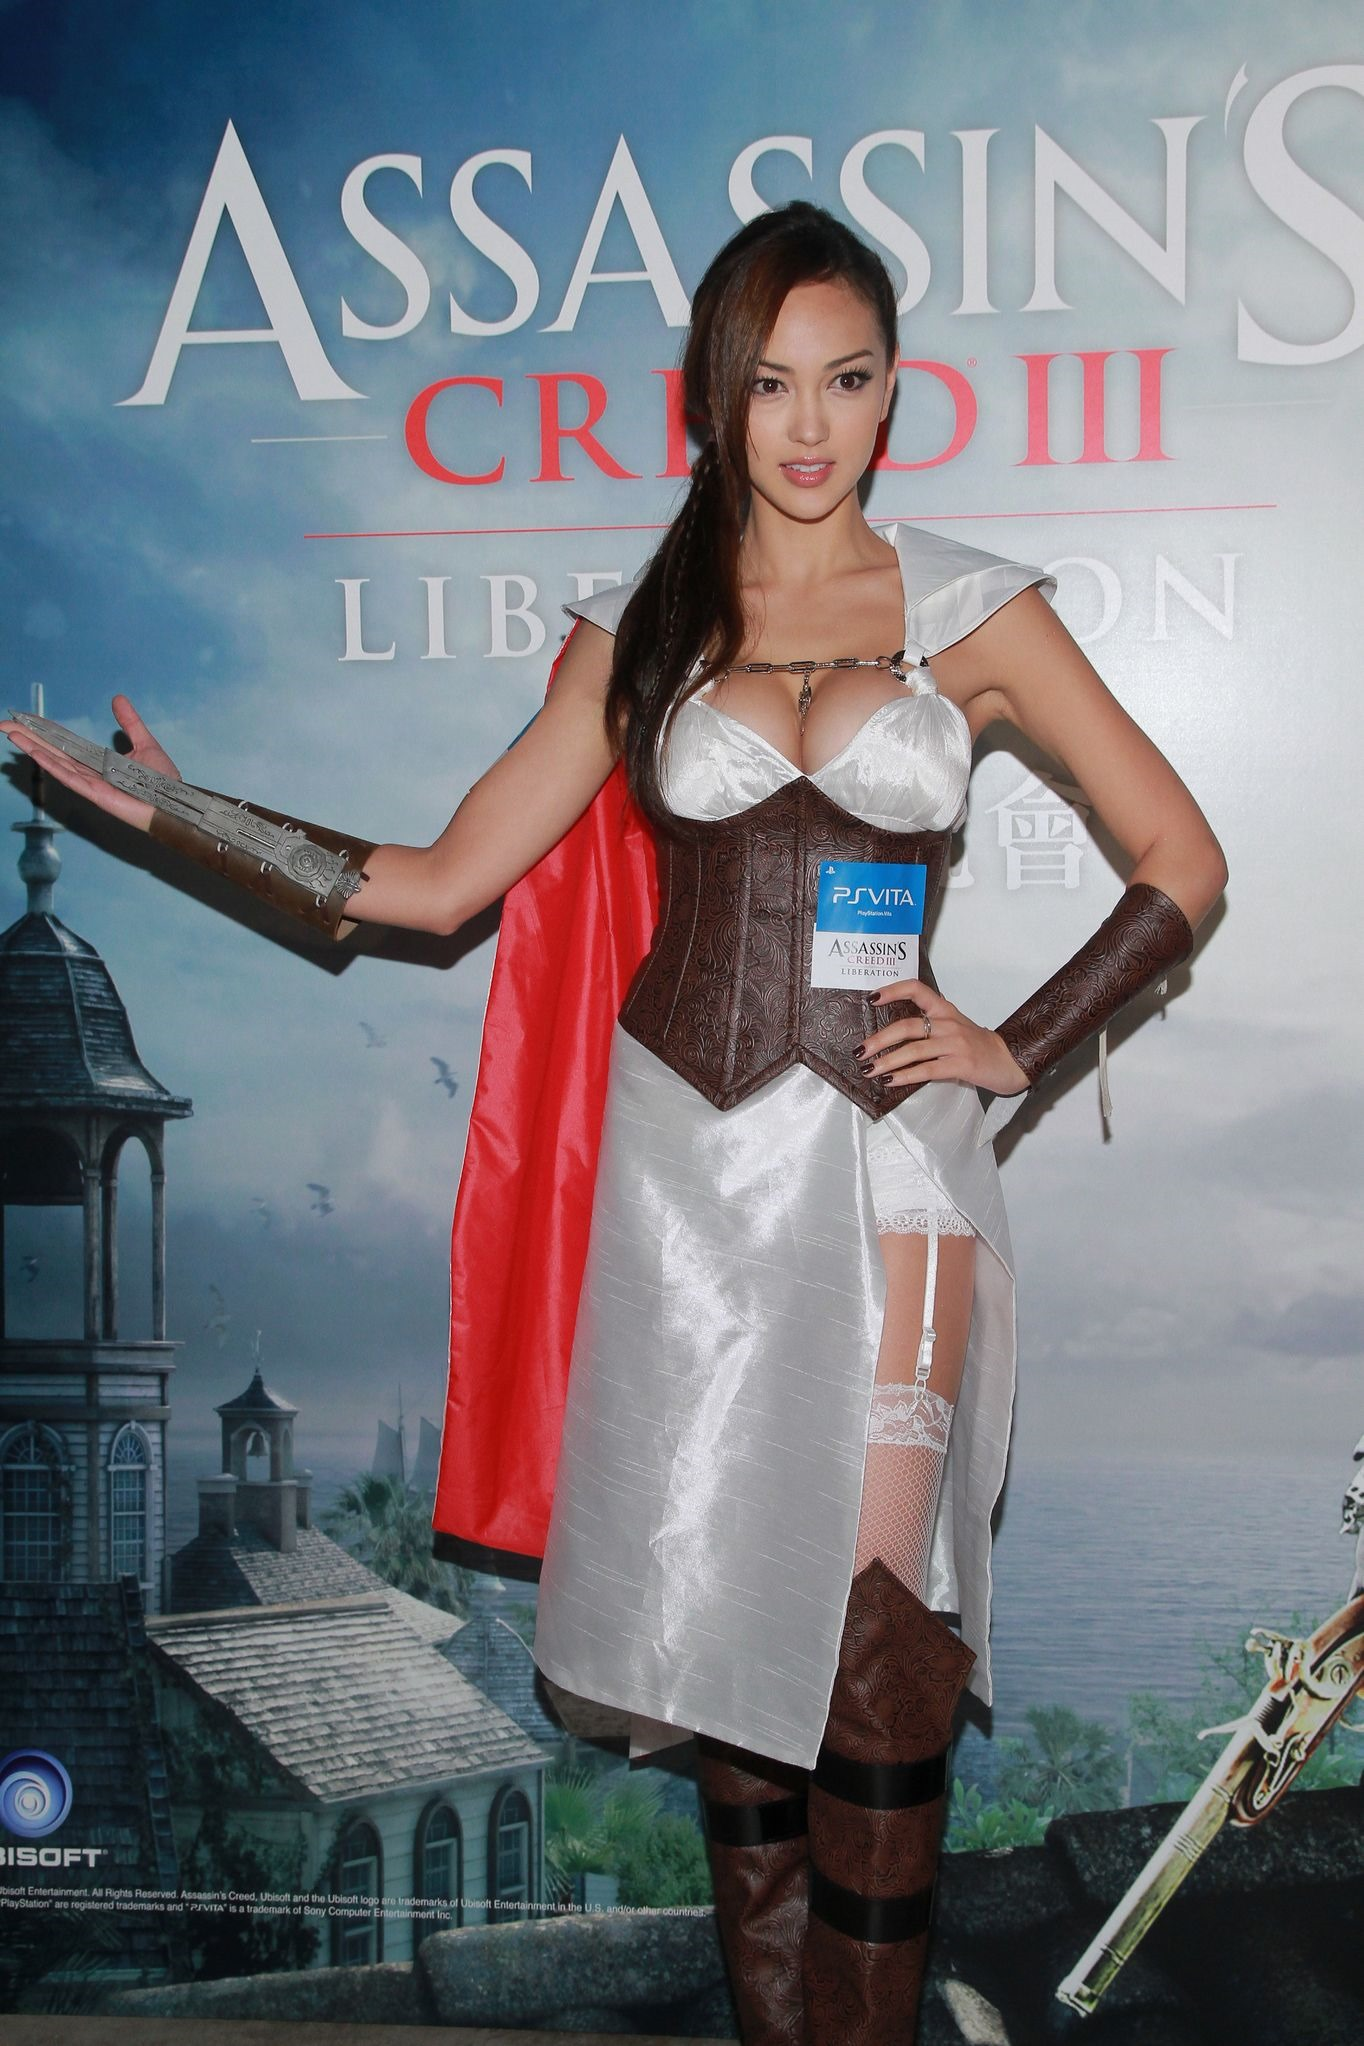 Assassins Creed III Liberation Cosplay